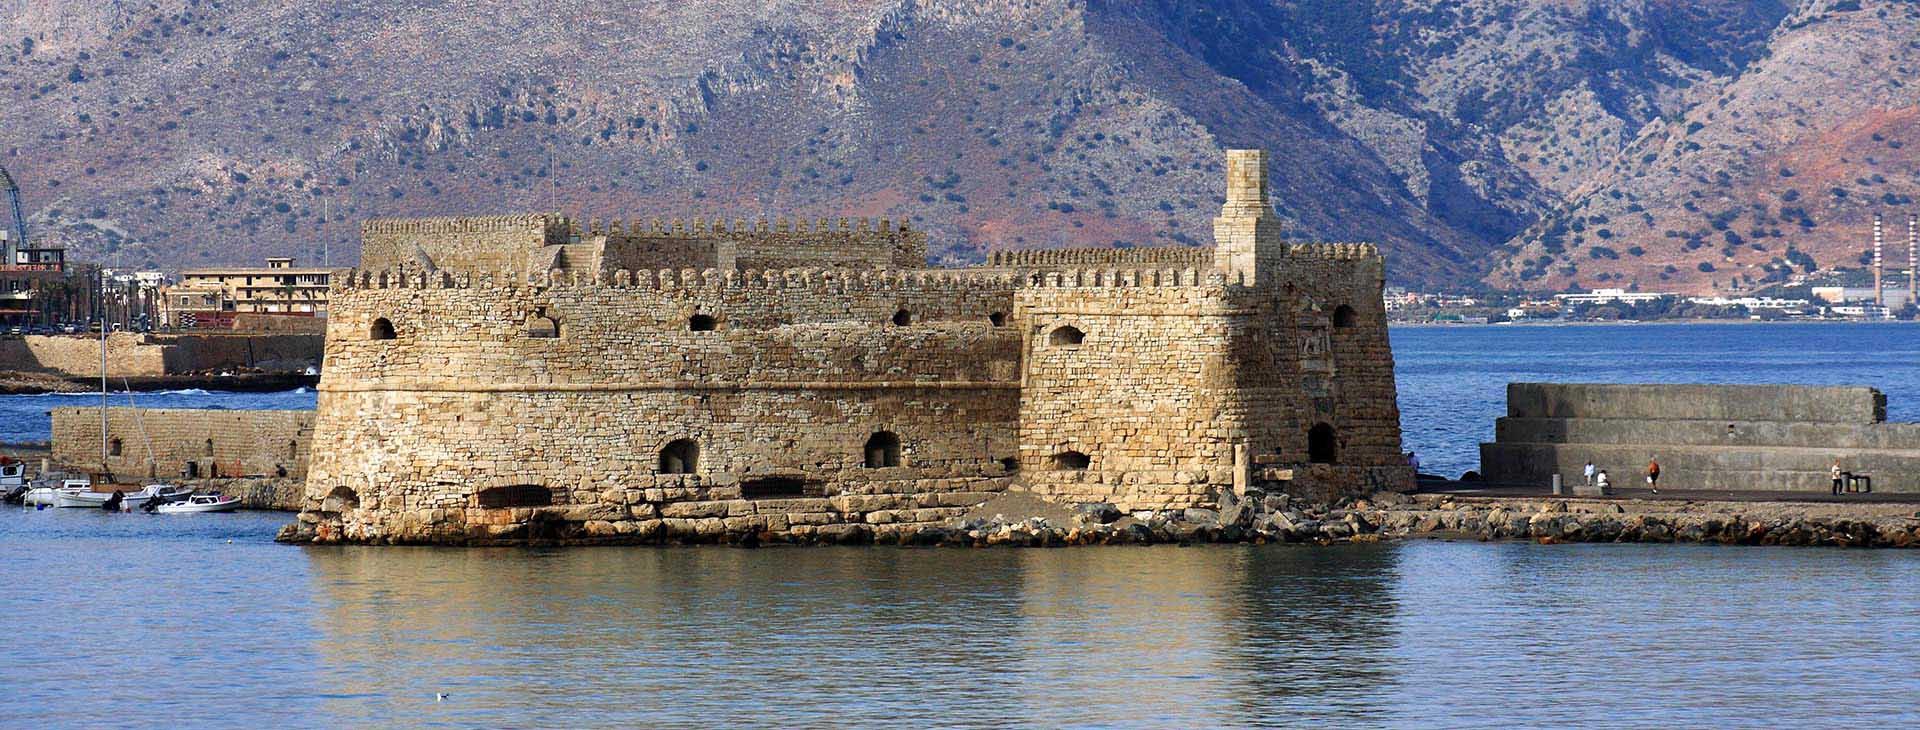 Koule castle in the old harbour, Heraklion city